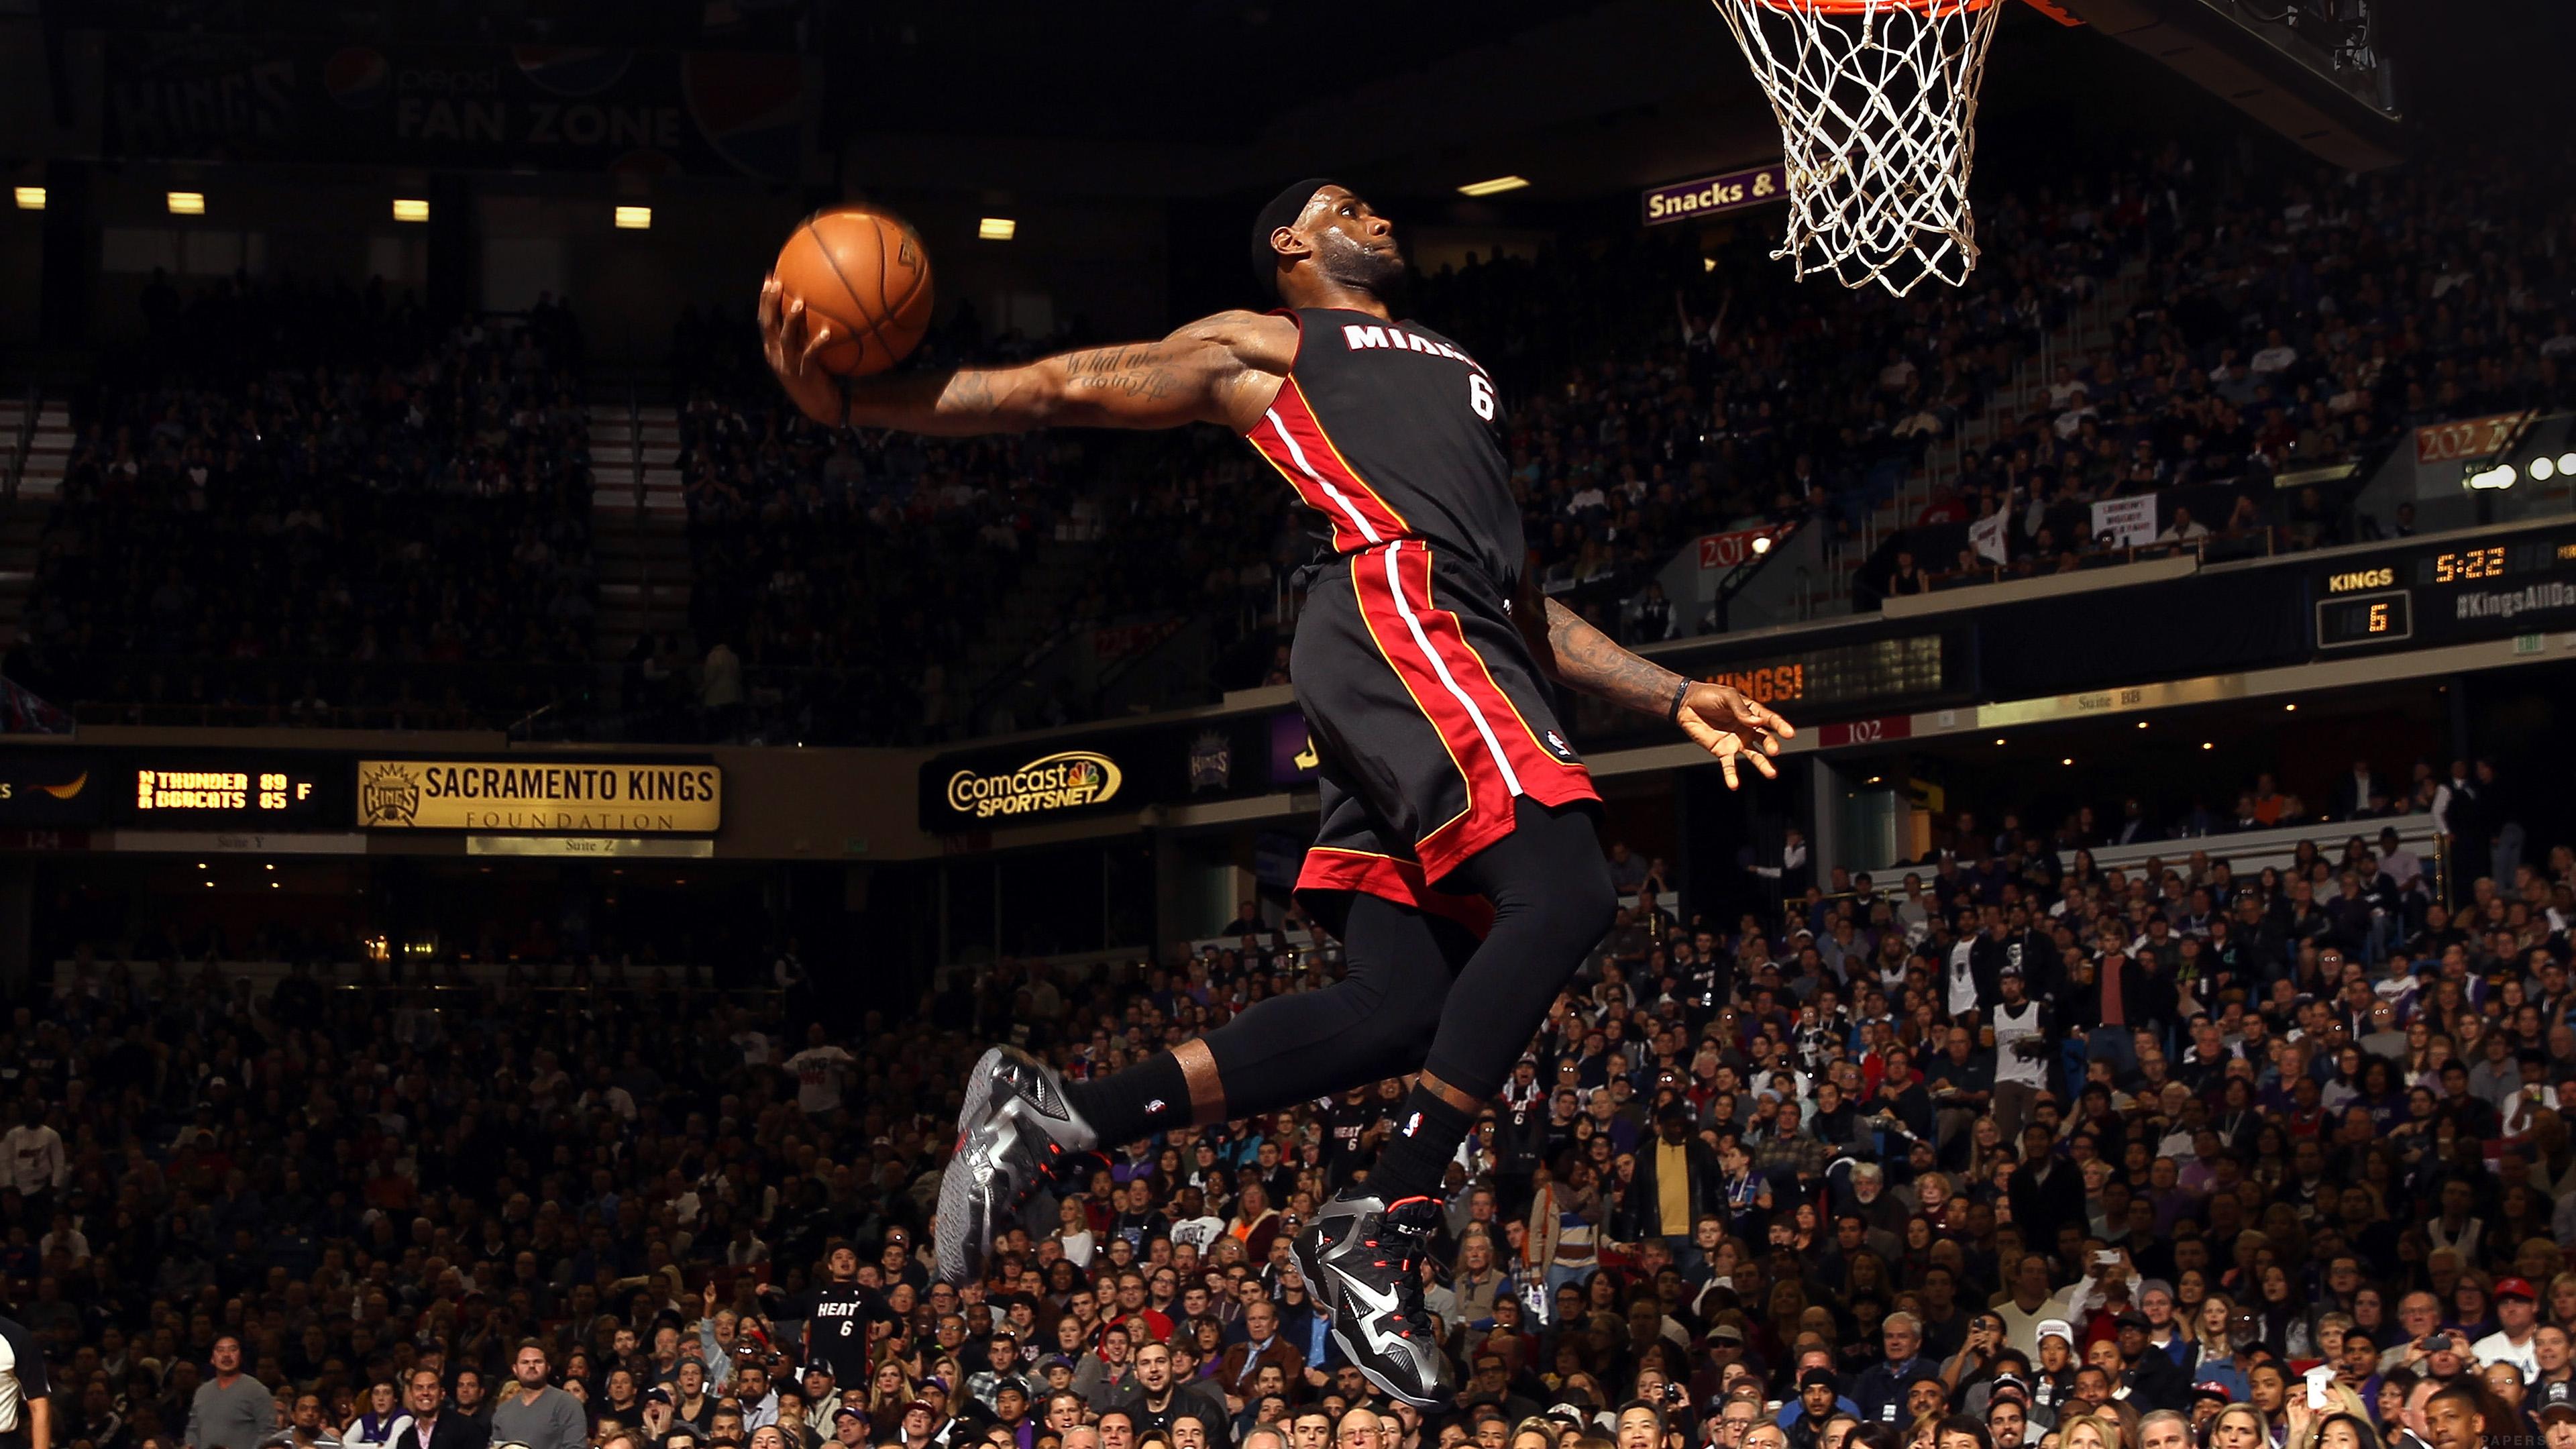 Free Fall Desktop Wallpaper For Mac He99 Lebron James Dunk Nba Sports Art Basketball Papers Co